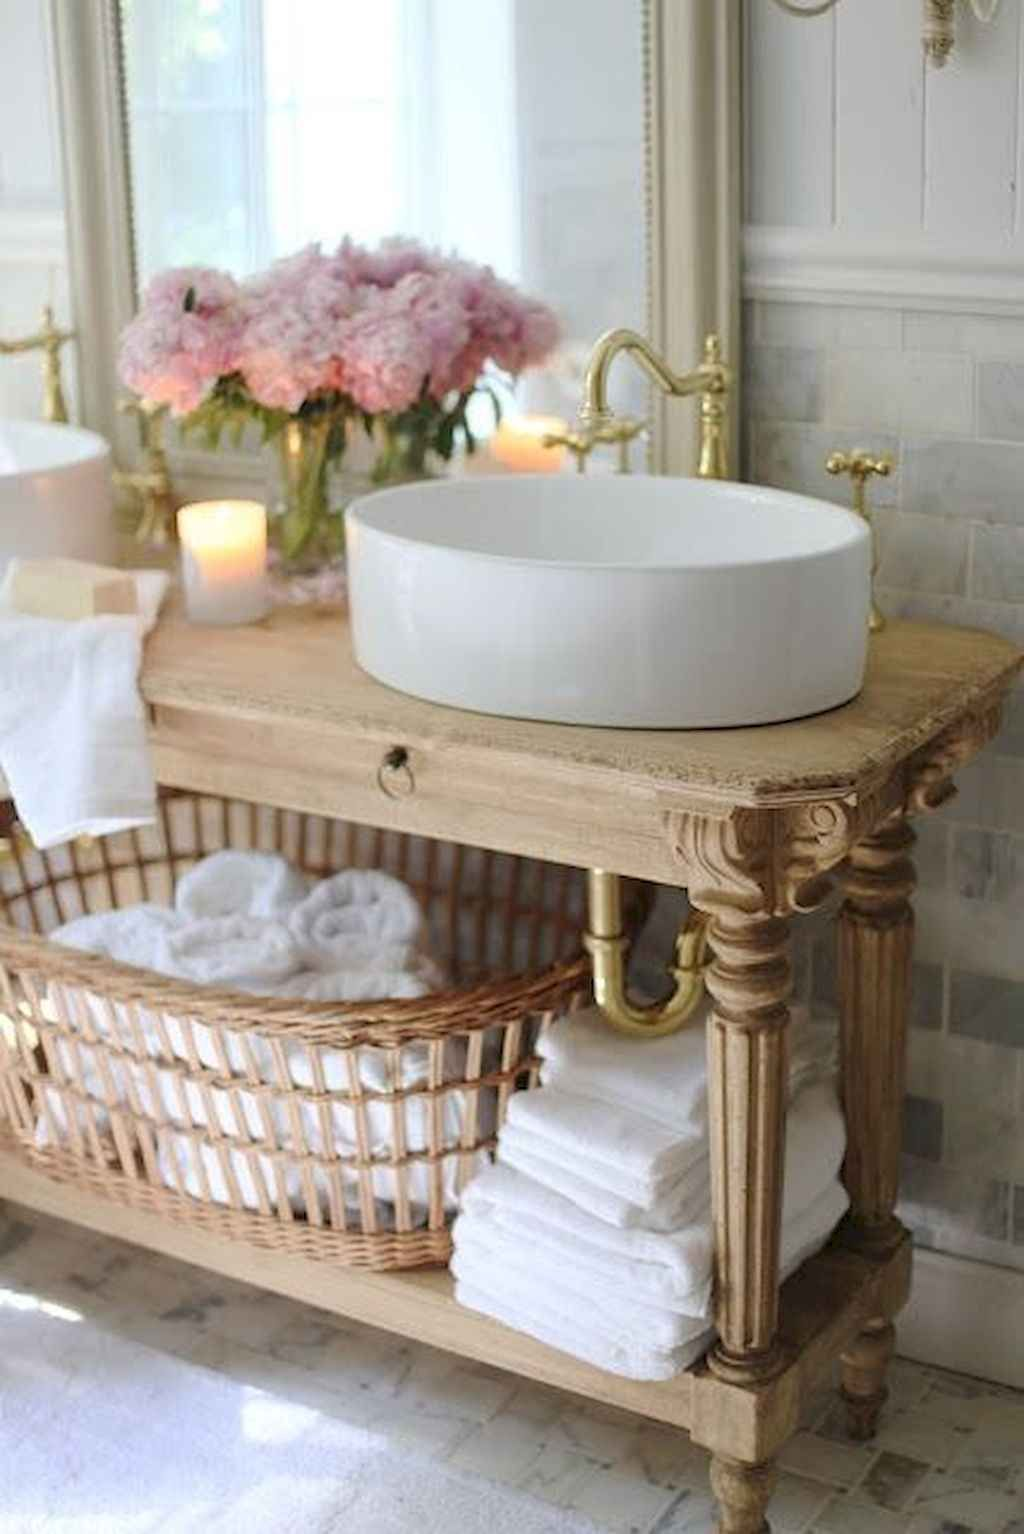 14 Inspiring French Country Bathroom Design Ideas French Cottage Bathroom French Country Bathroom Country Cottage Decor